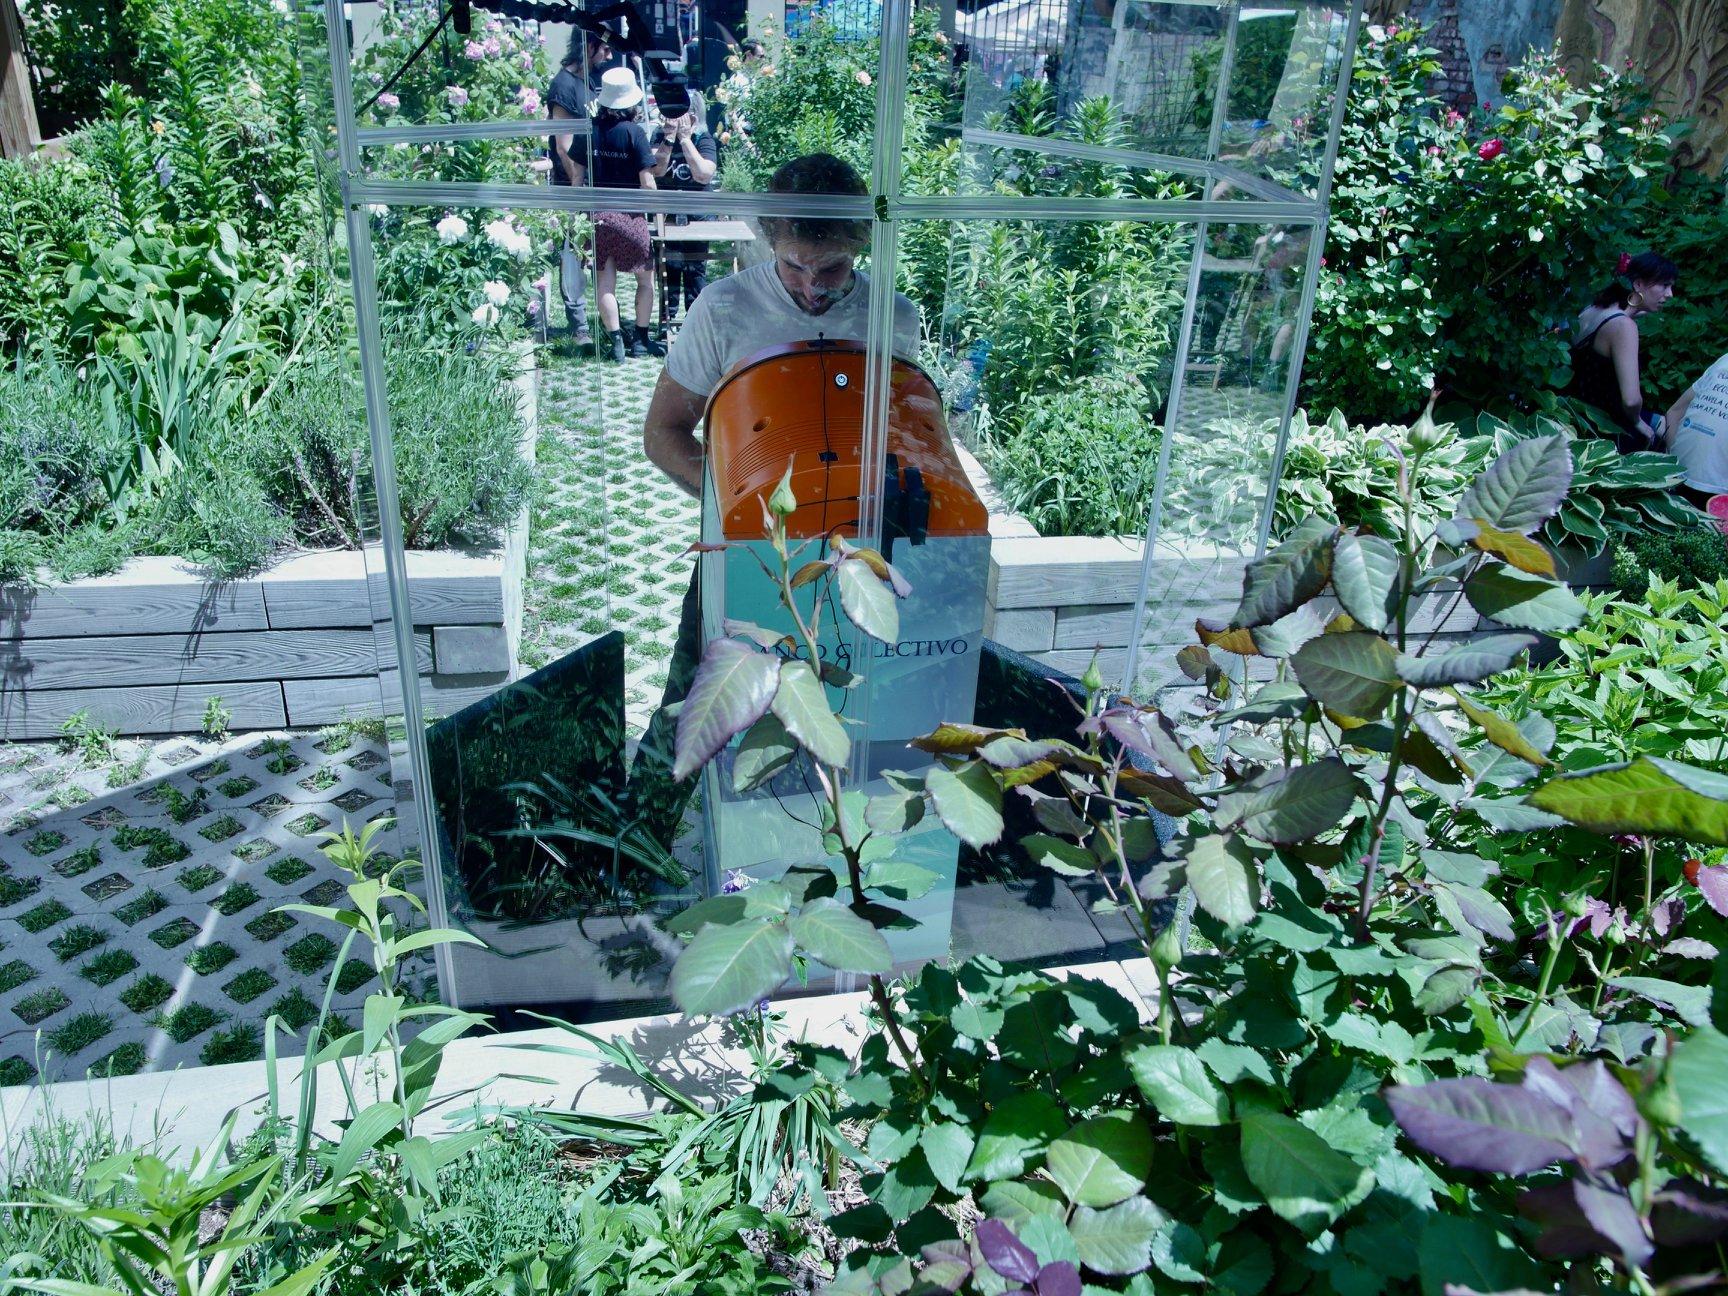 The VyC inthe garden.jpg